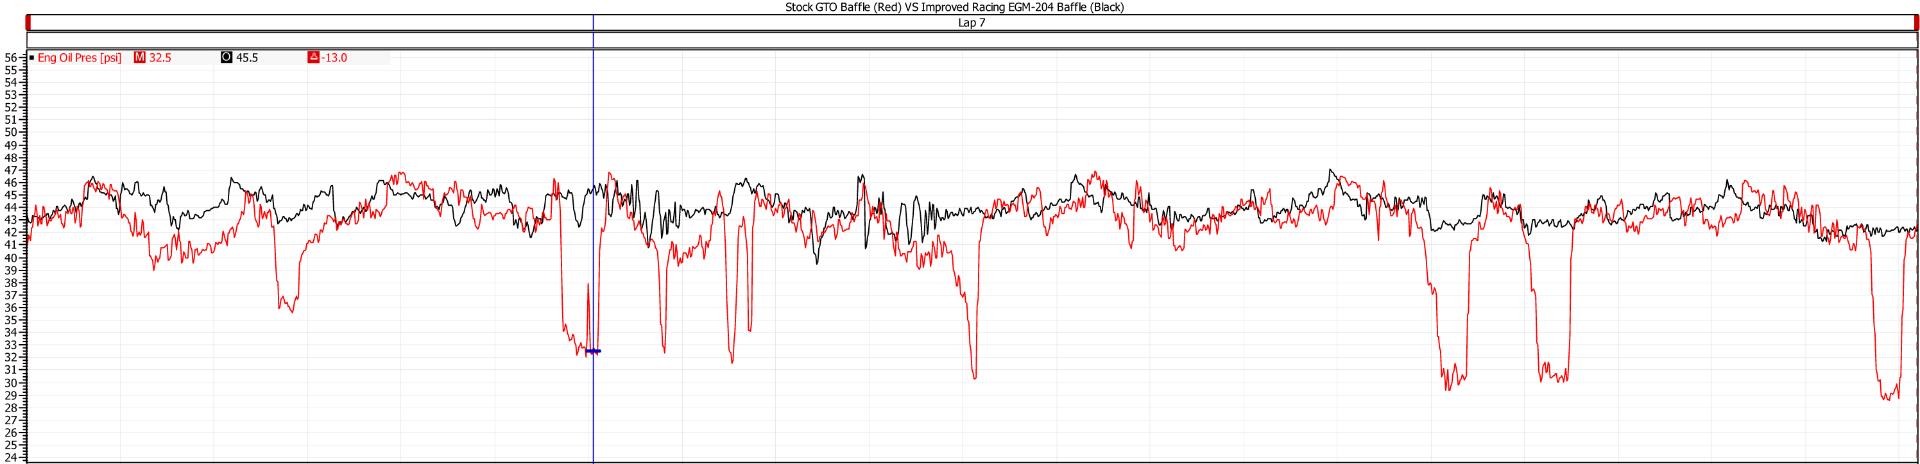 Improved Racing EGM-202 Baffling Inserts Oil Pressure Chart